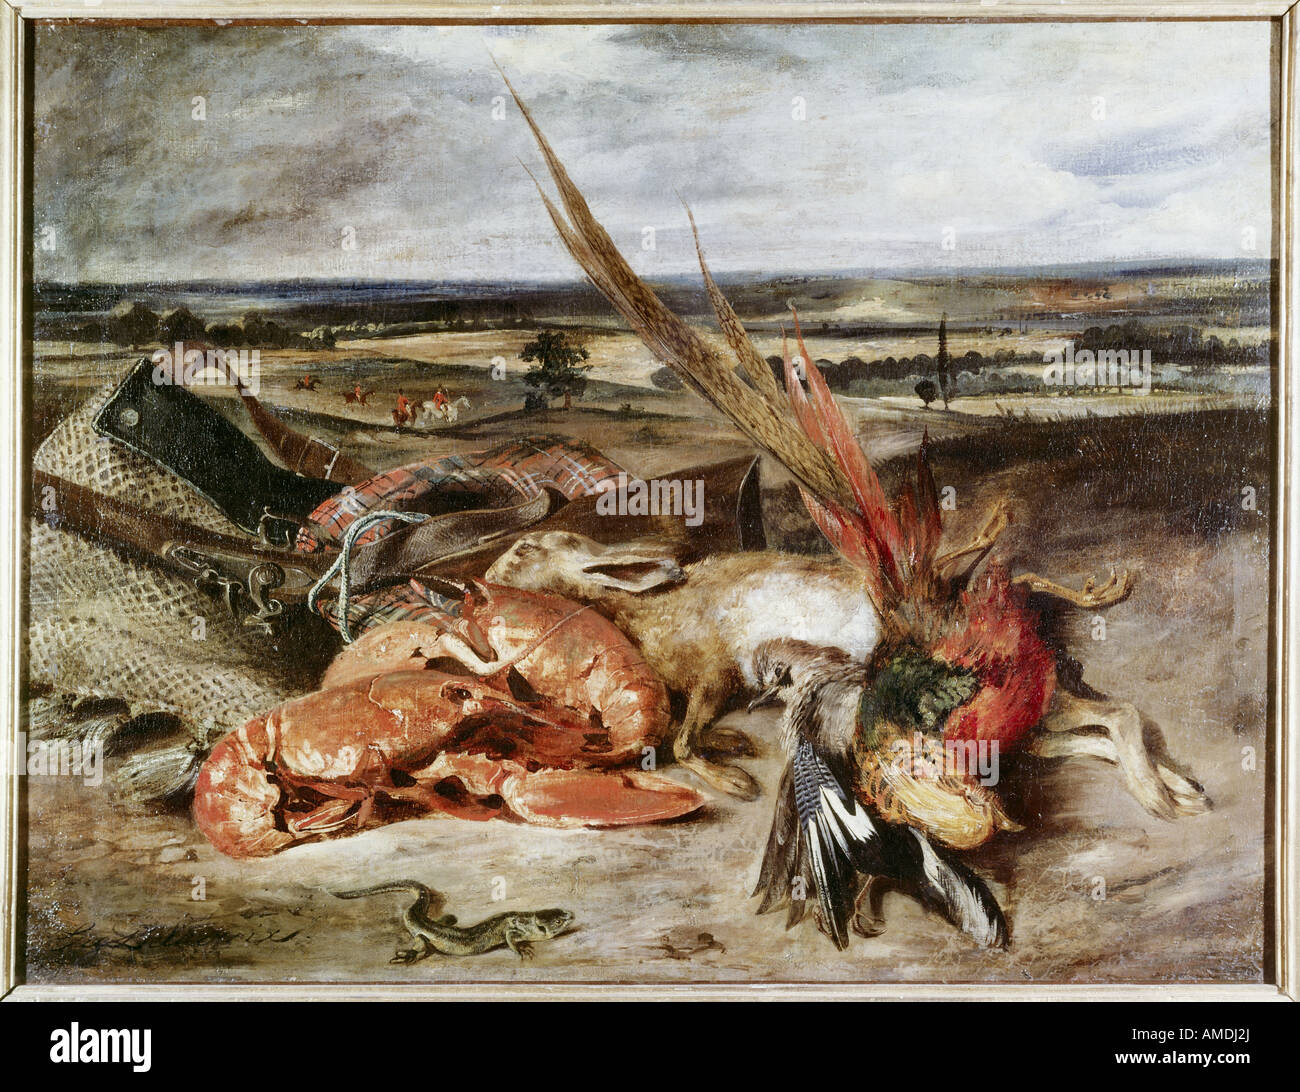 'Fine Arts, Delacroix, Eugène (1798 - 1863), peinture, 'Still Life' avec les homards, 1826/1827, Photo Stock